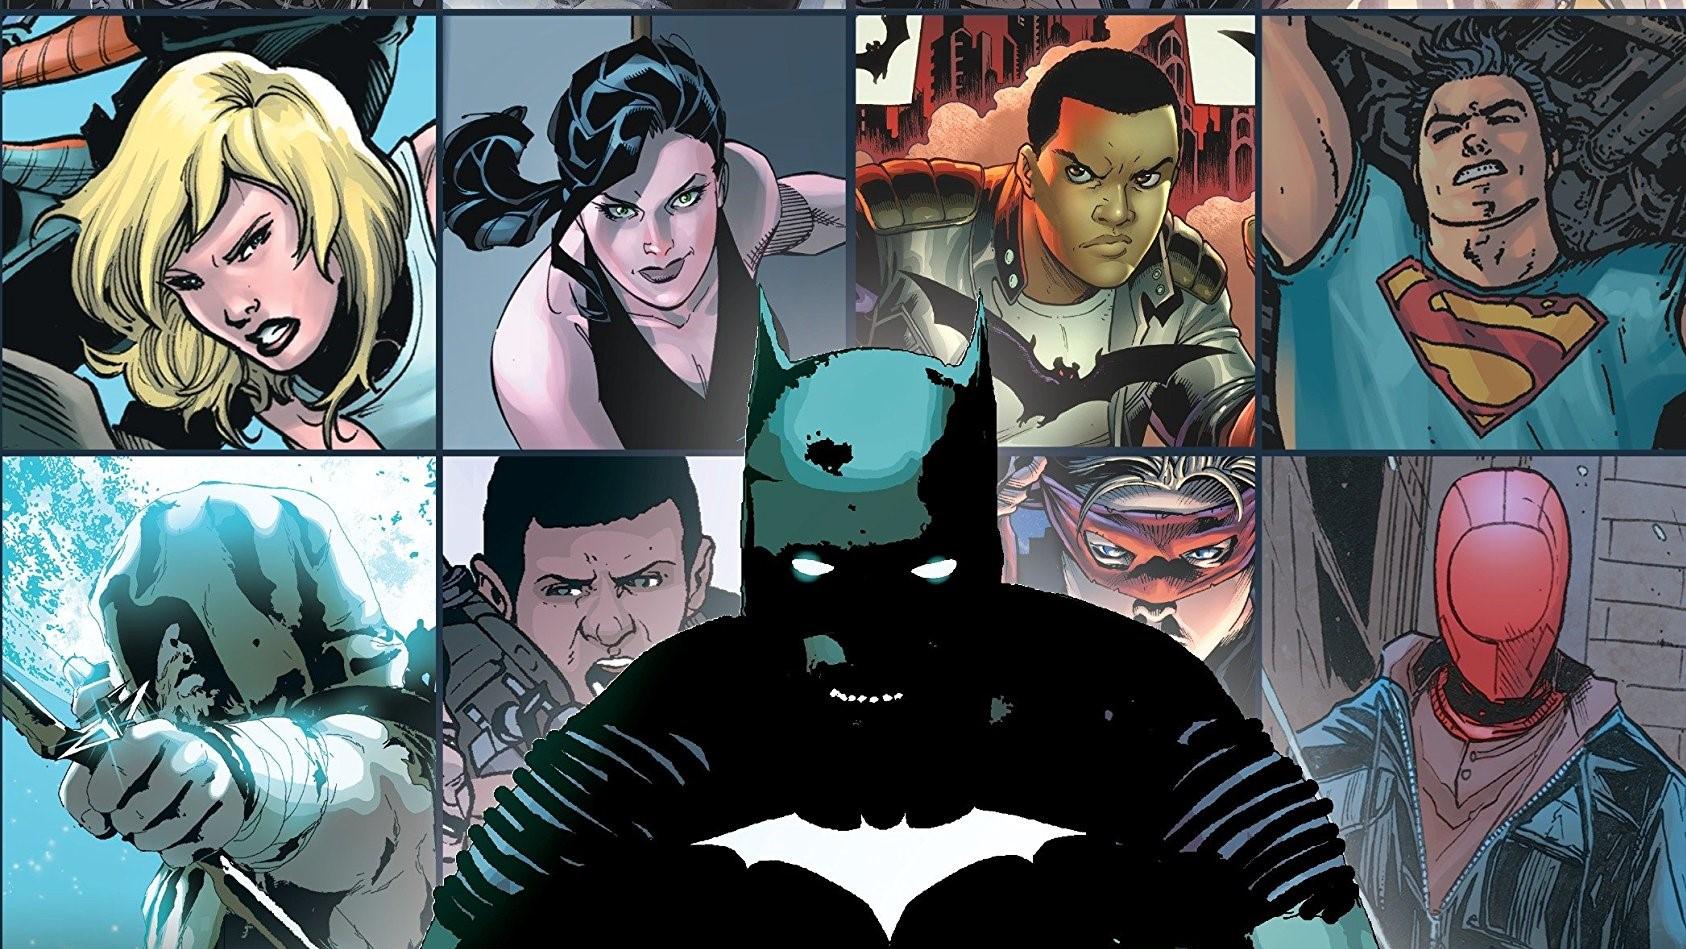 Excerpt of the cover of DC Comics Zero Year